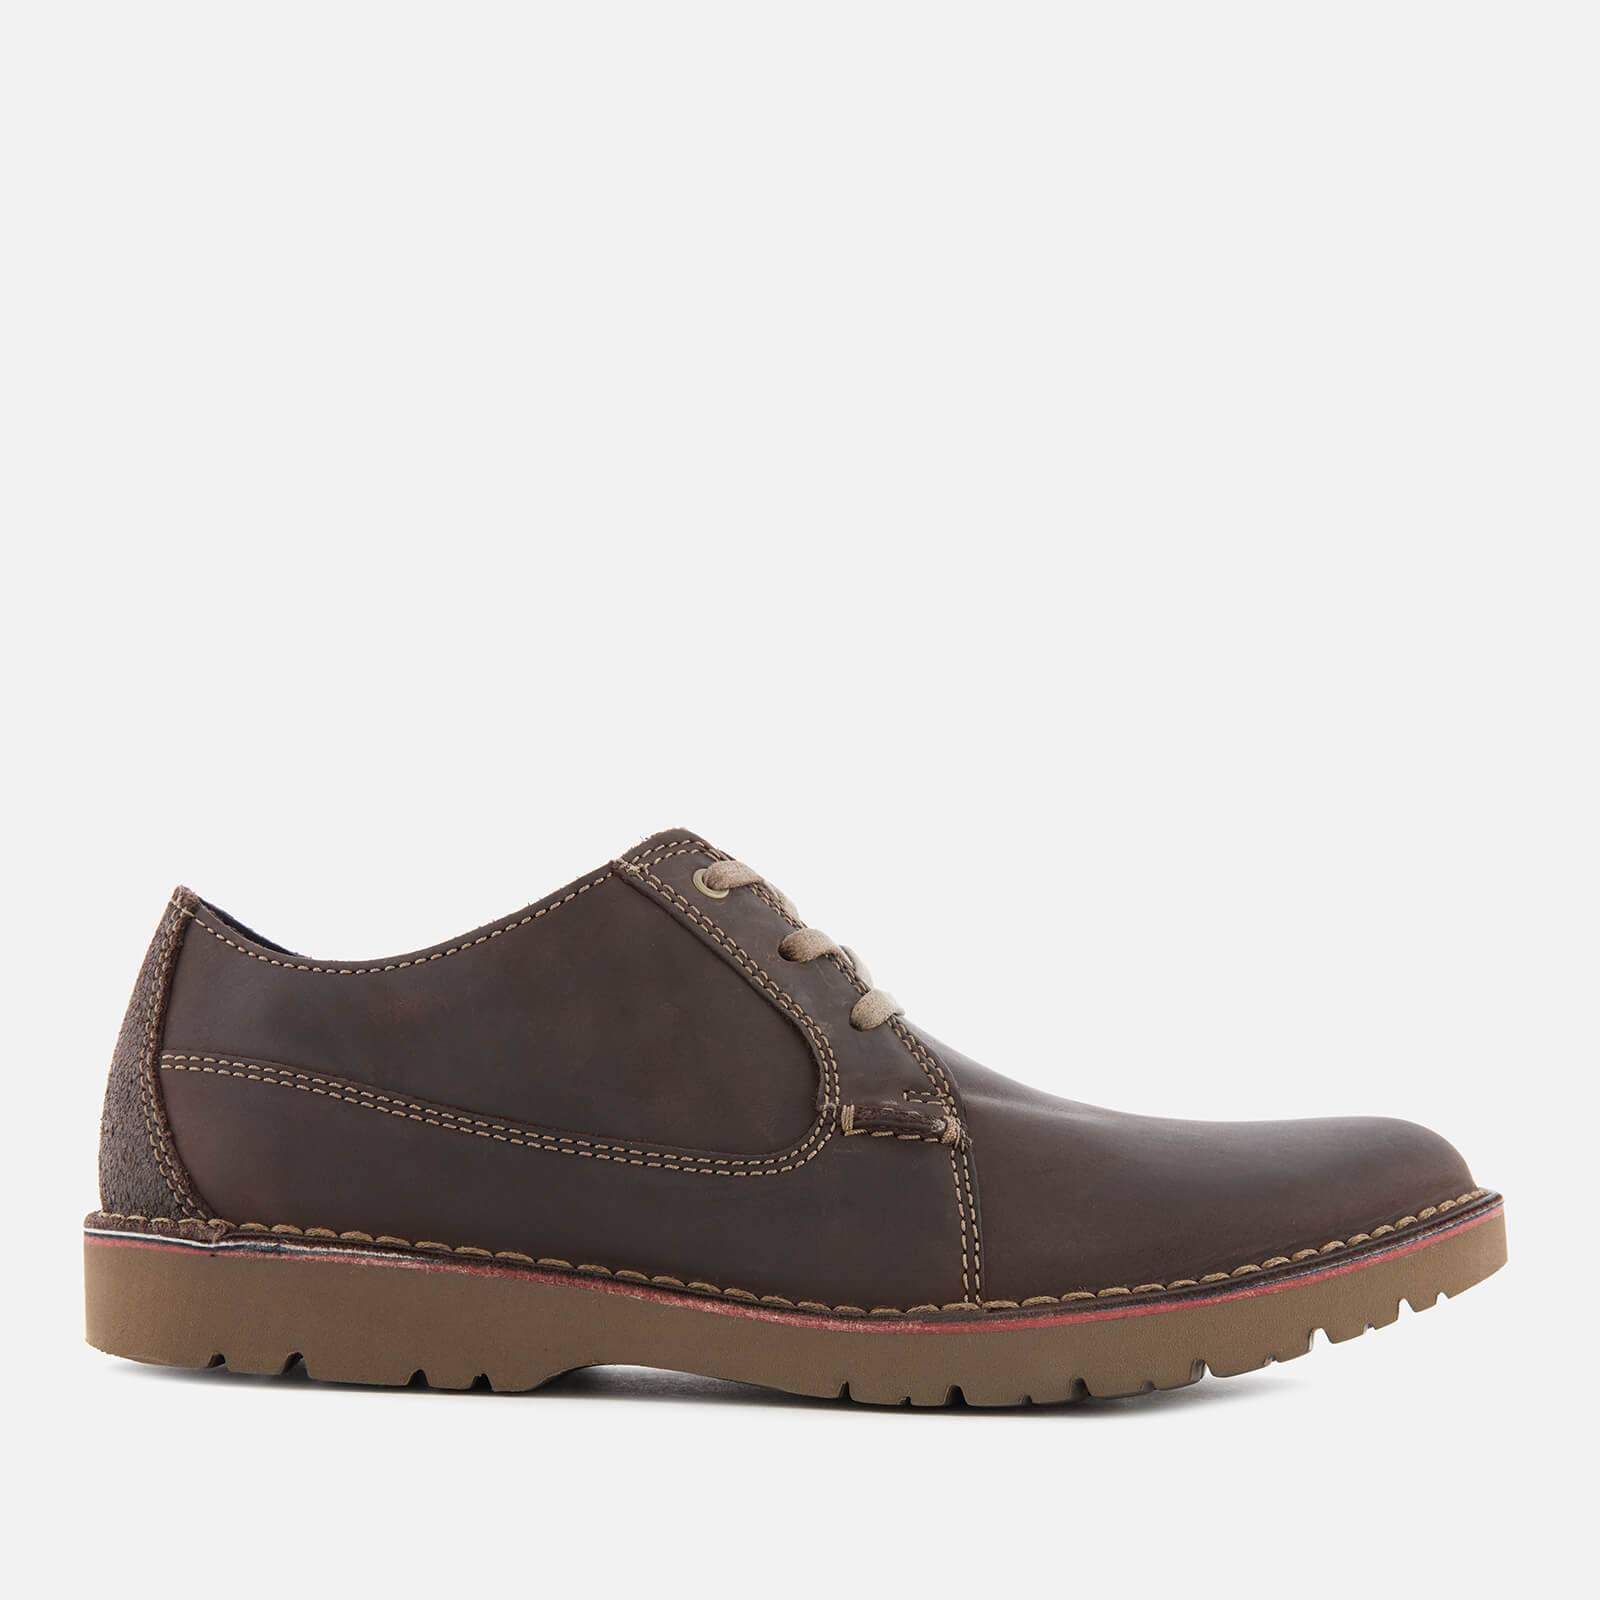 Clarks Men's Vargo Plain Leather Derby Shoes - Dark Brown - UK 8